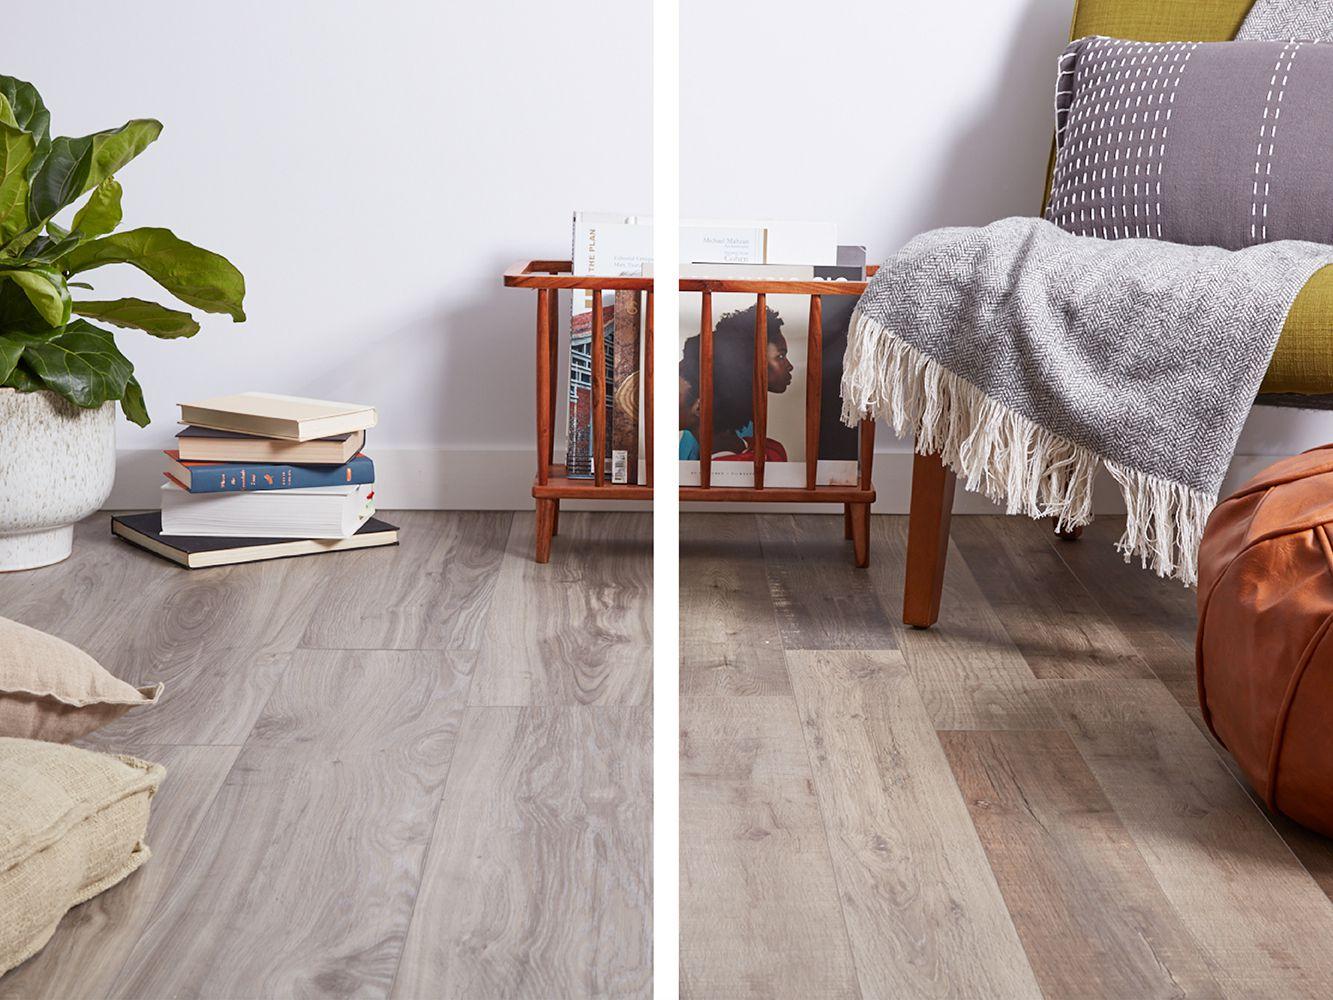 Things to be aware of before buying vinyl flooring